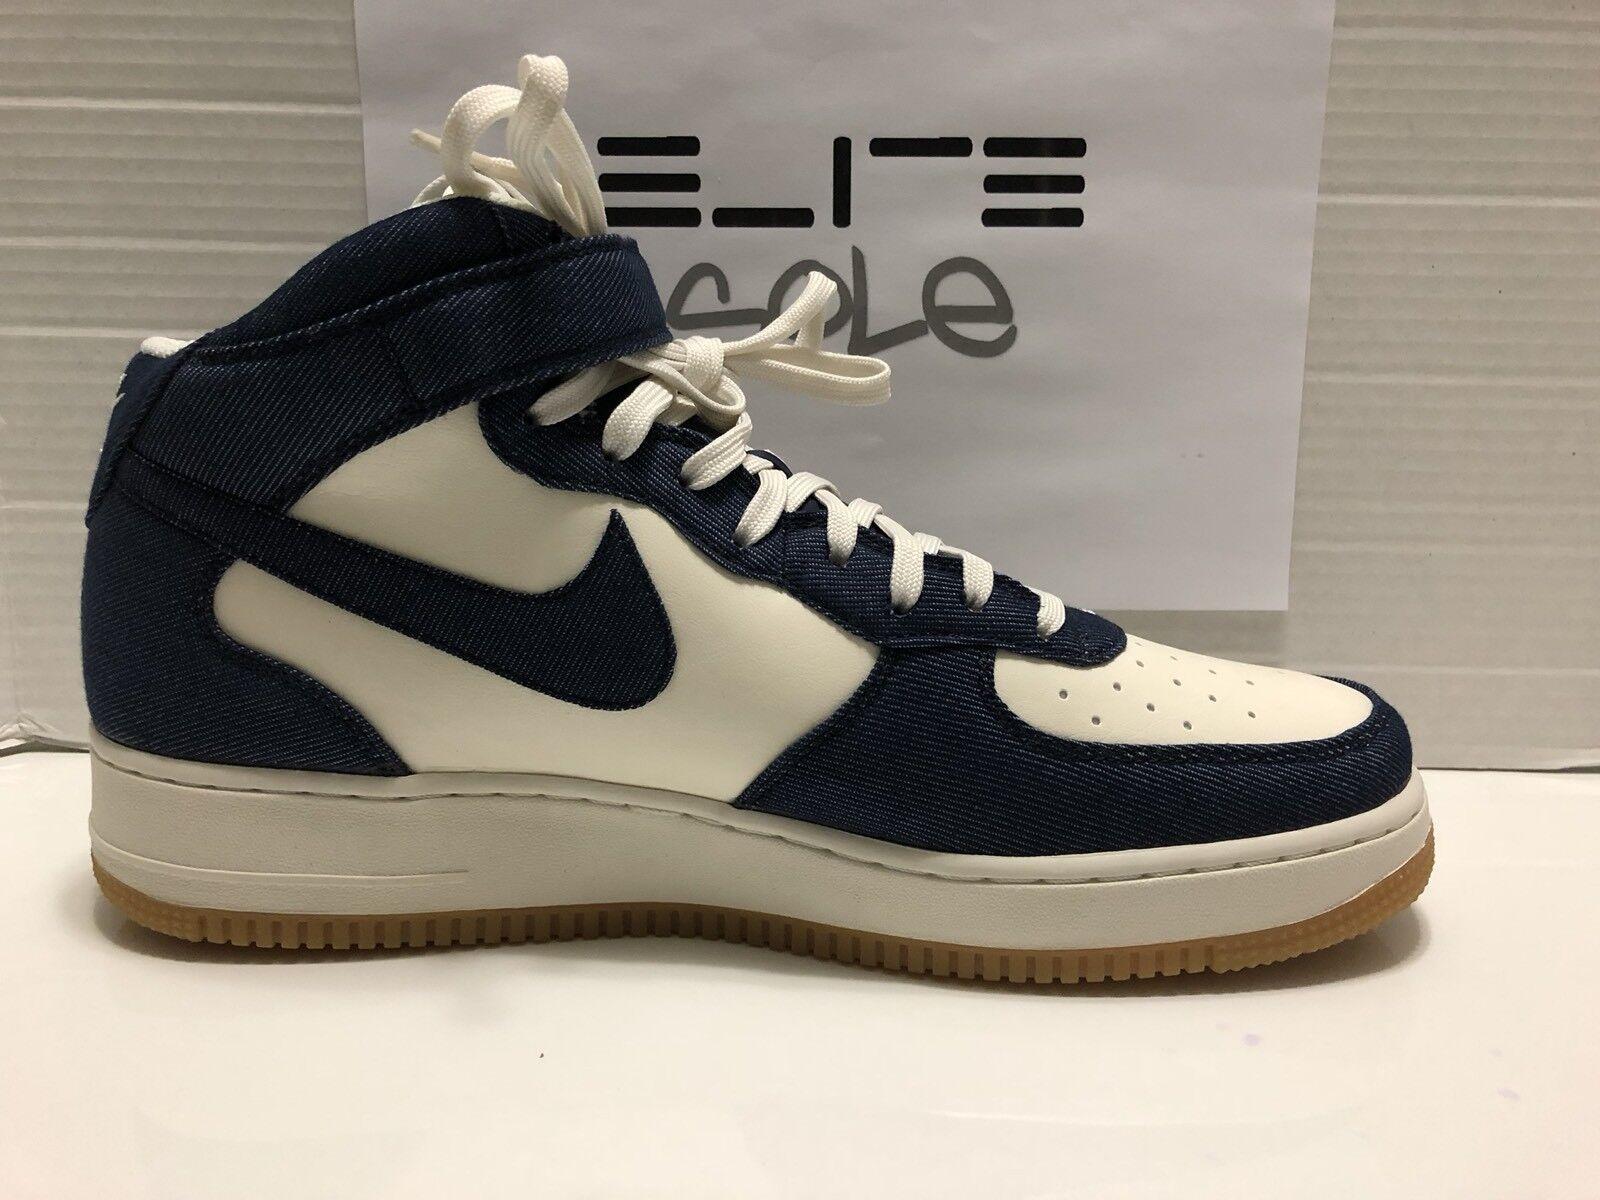 Nike air force 1 met 2007 denim sz ossidiana navigare [315123 408] sz denim 13 5f677e